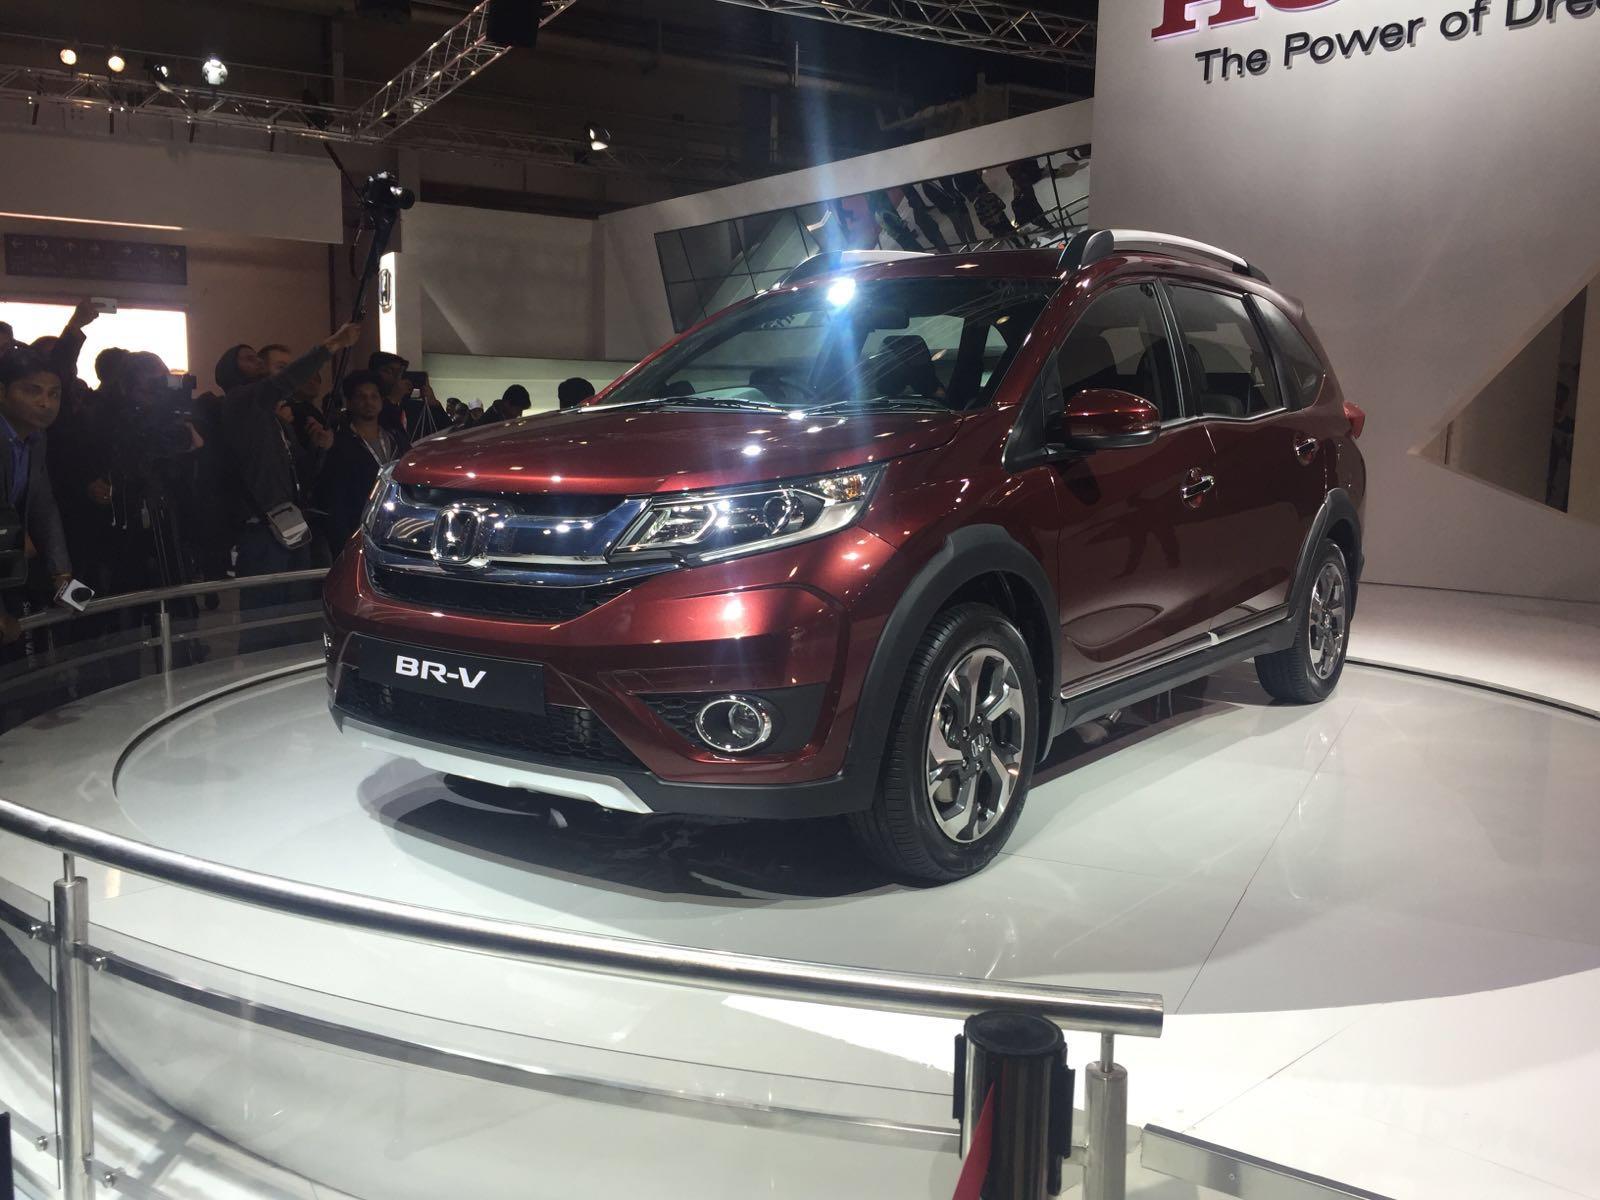 Honda brv india auto expo photos 3